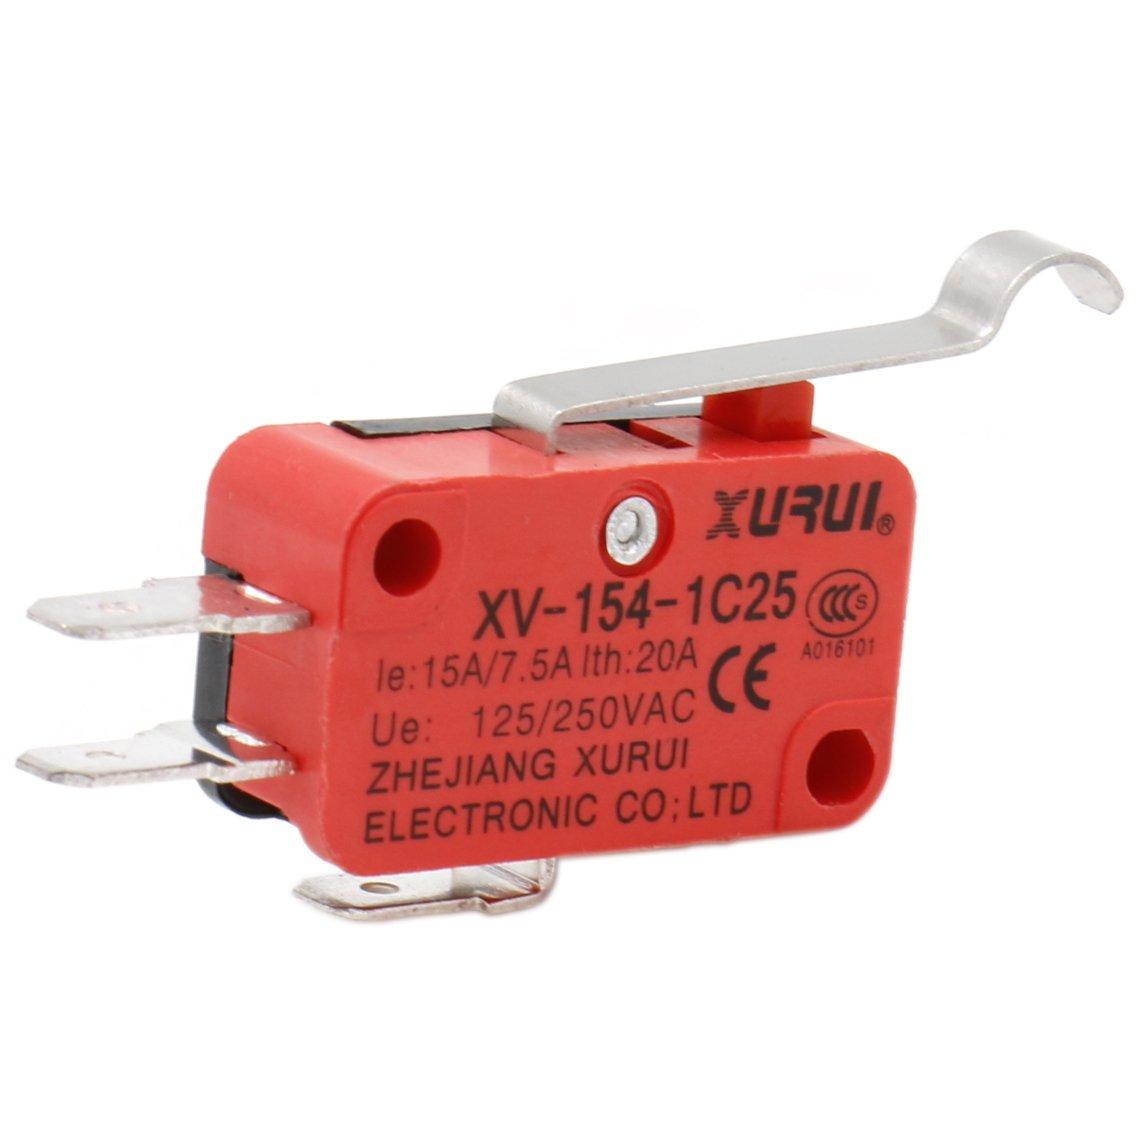 heschen Micro interruptor V-154/ /1/C25/SPDT manivela tipo 20/A 250/VAC 2/unidades